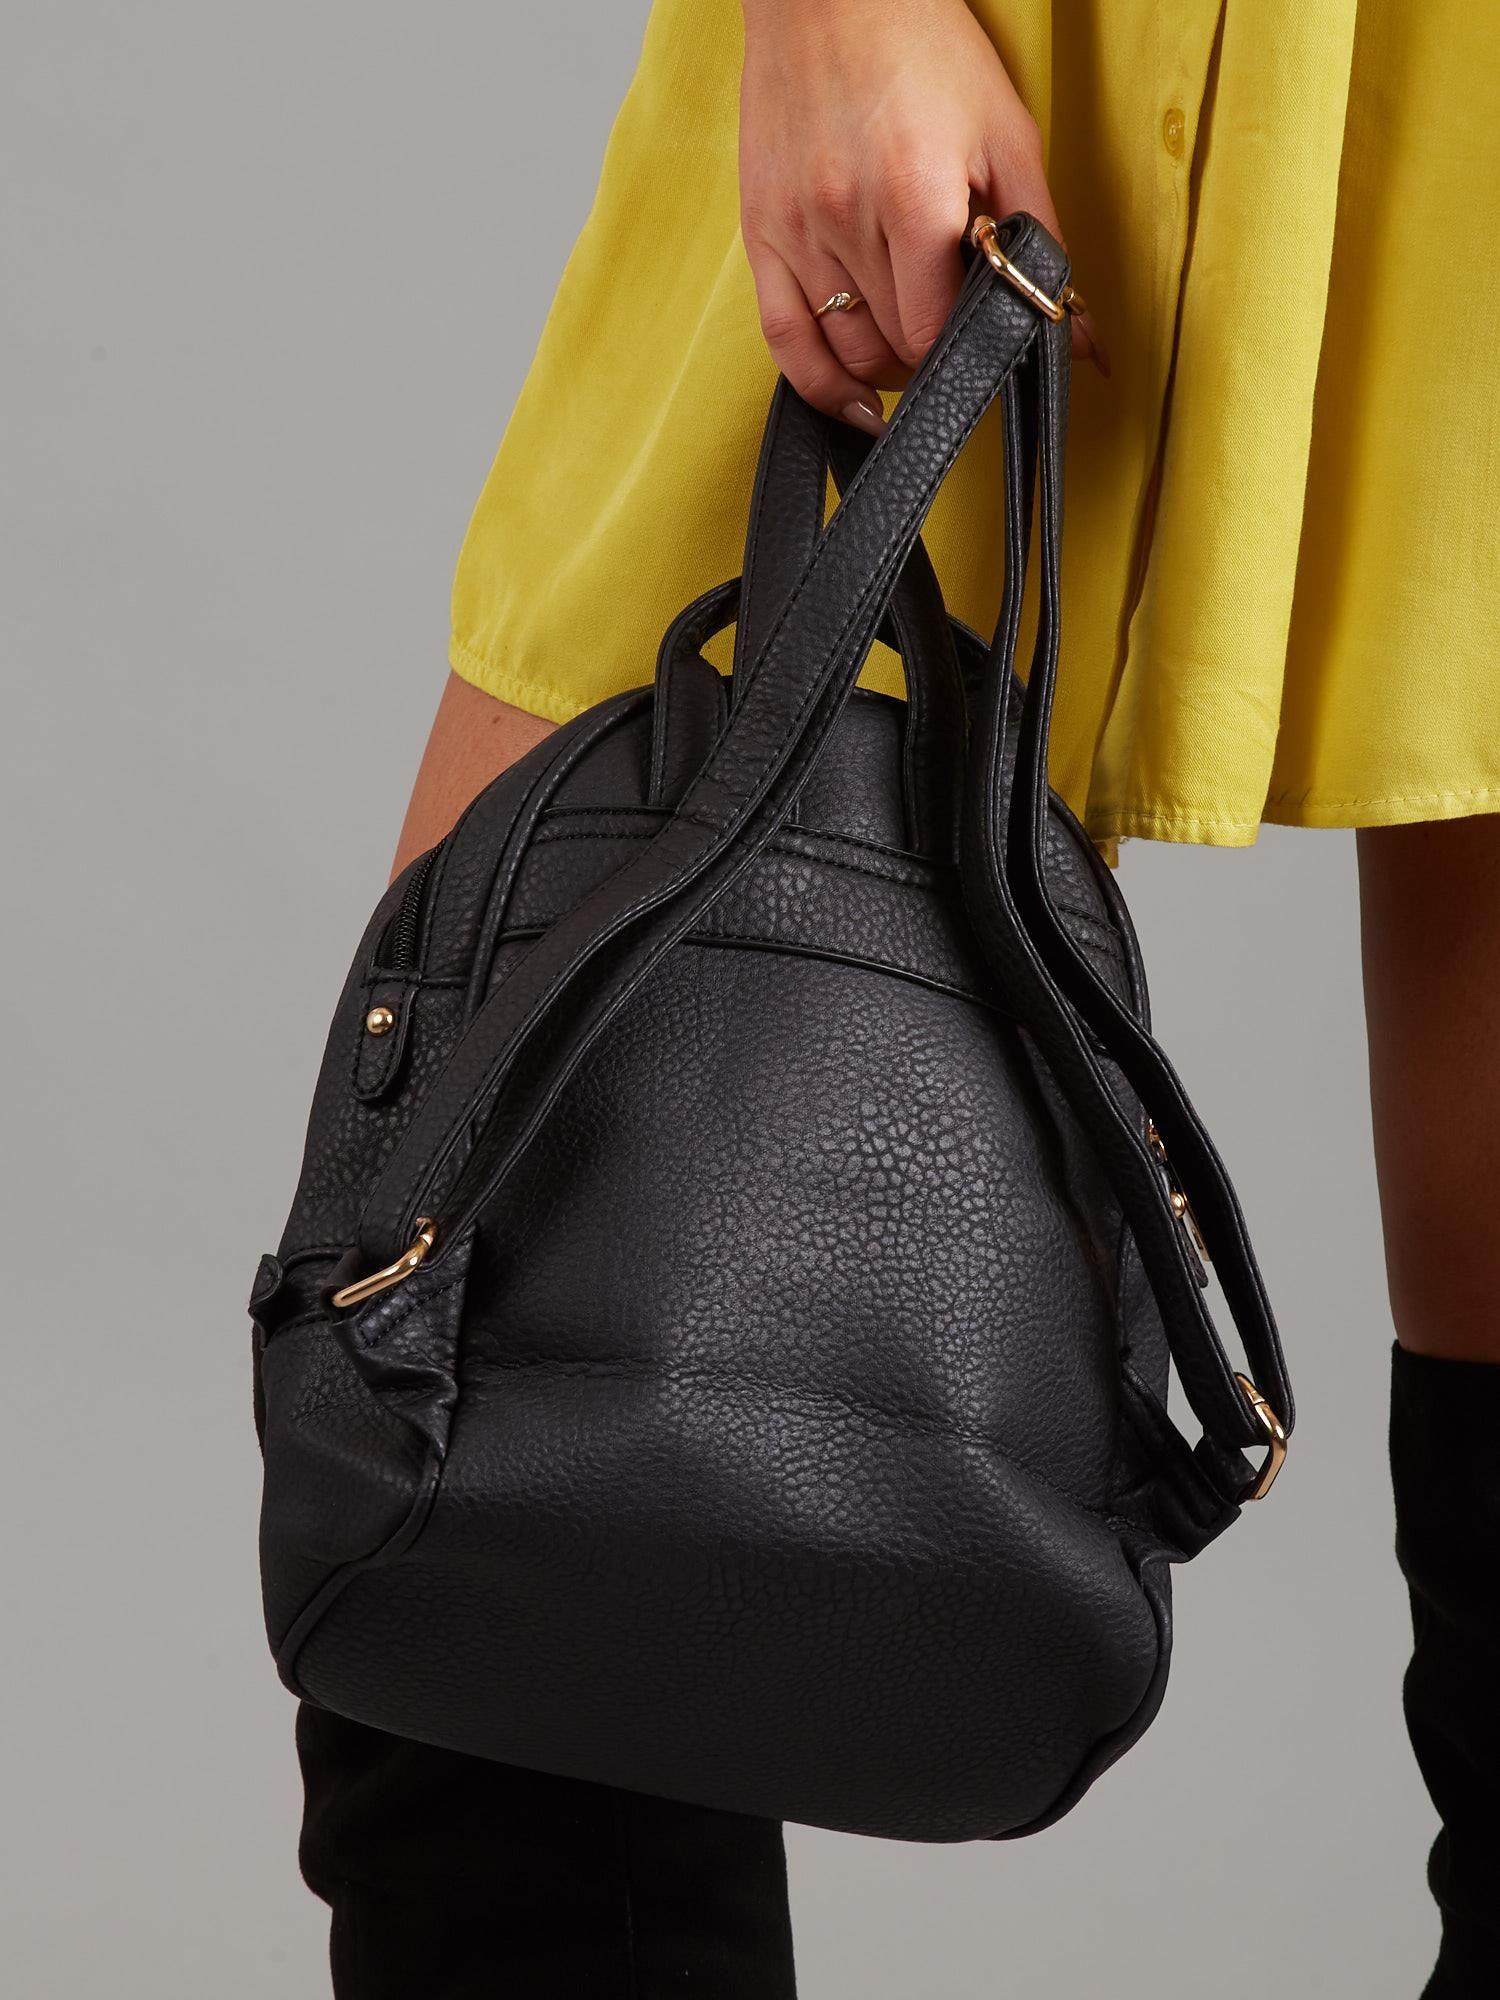 260fb9be9eacb Czarny mały plecak ze skóry ekologicznej - Akcesoria torba - sklep ...